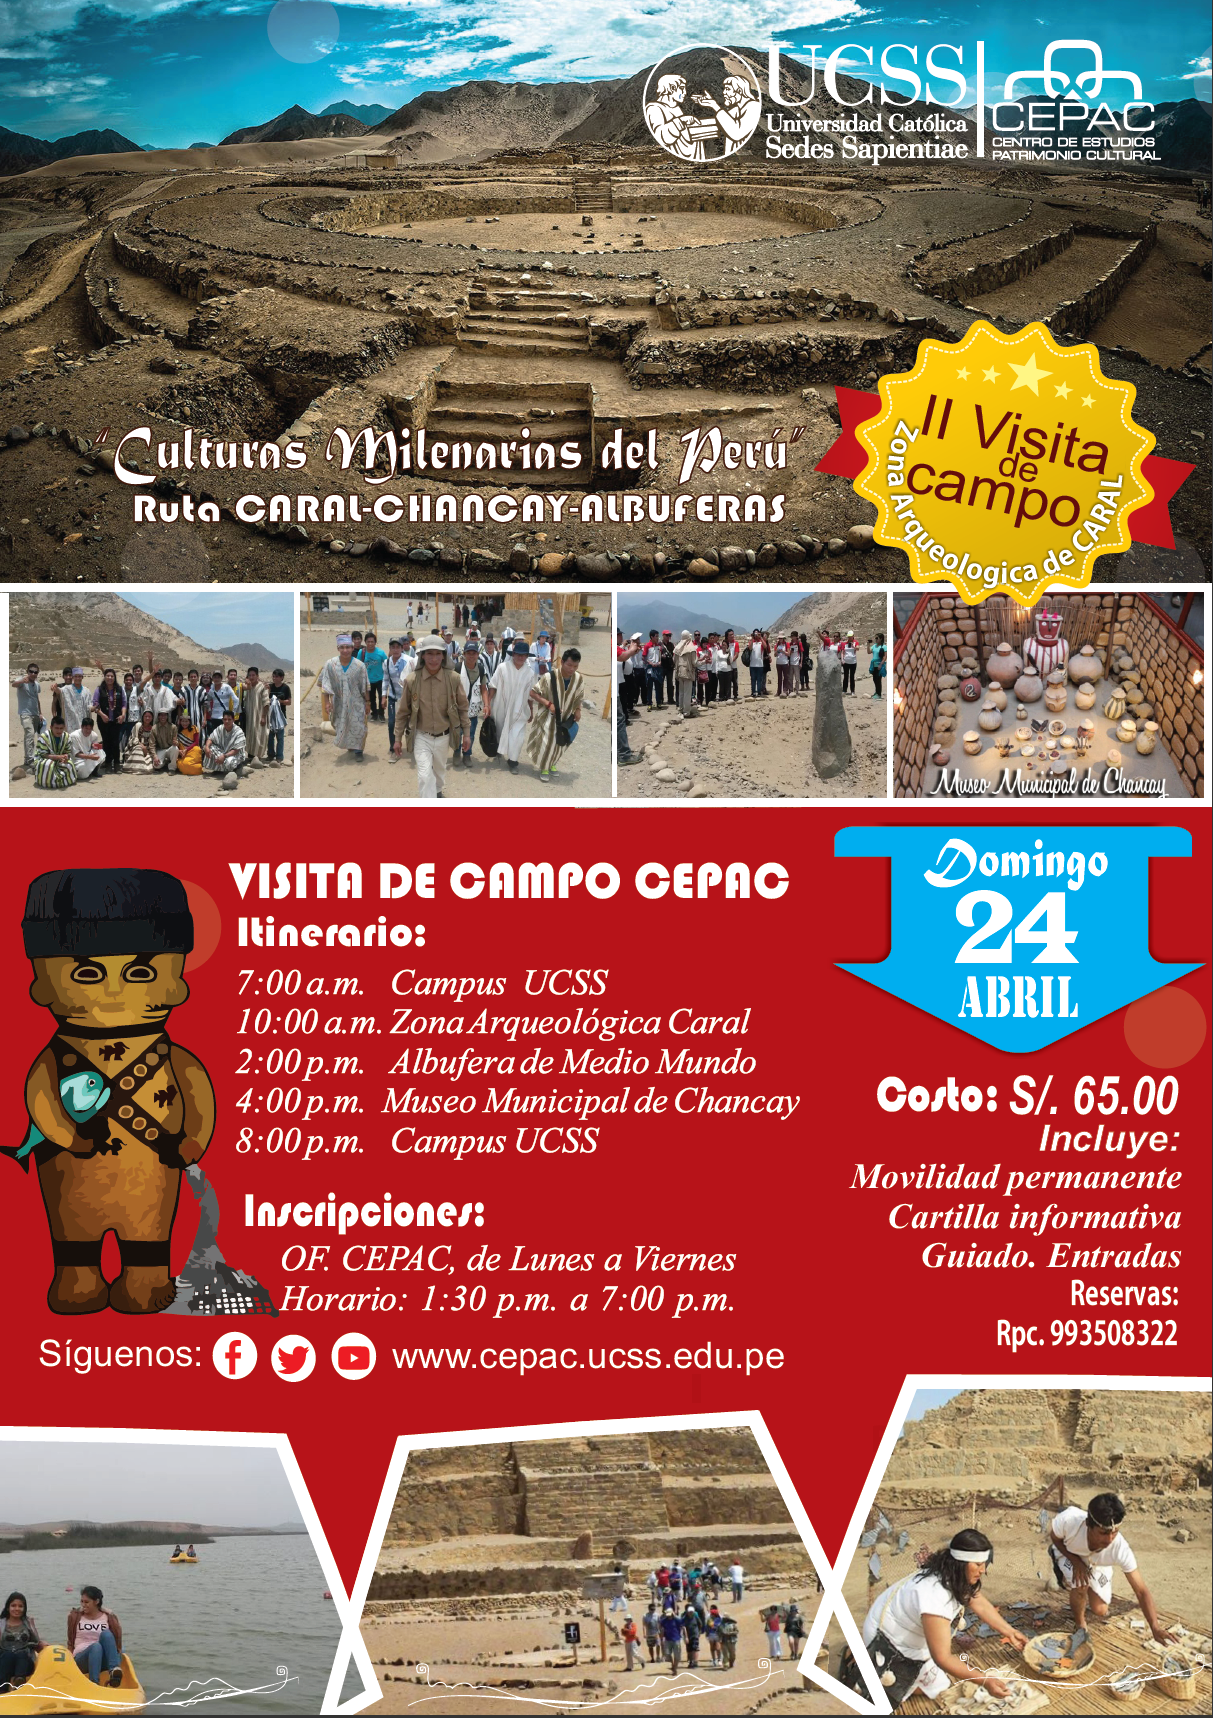 DOMINGO 24 ABR. RUTA CARAL-ALBUFERAS-CHANCAY